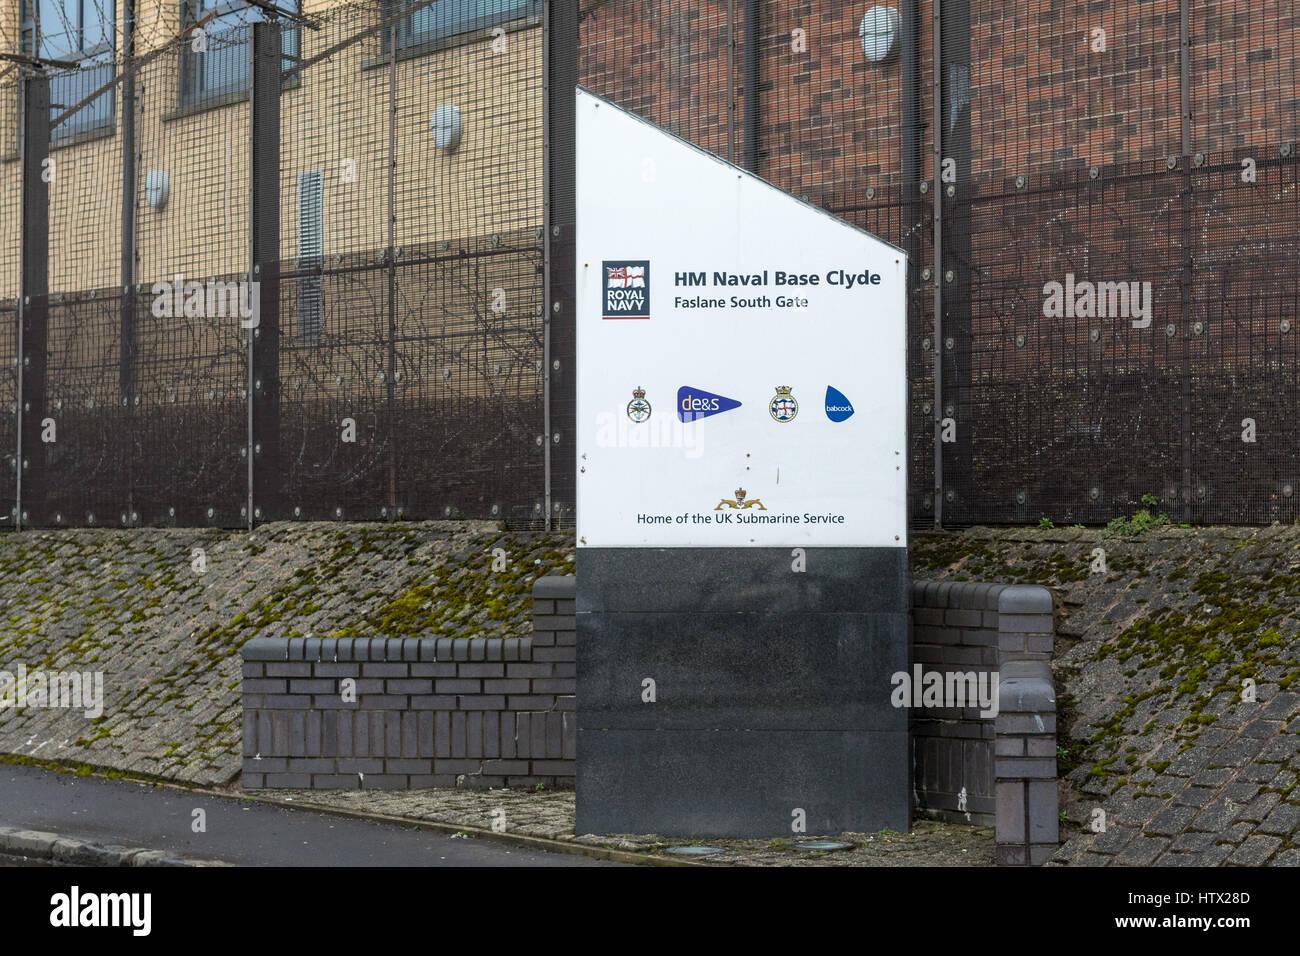 HM Naval Base Clyde - Faslane South Gate sign - Stock Image